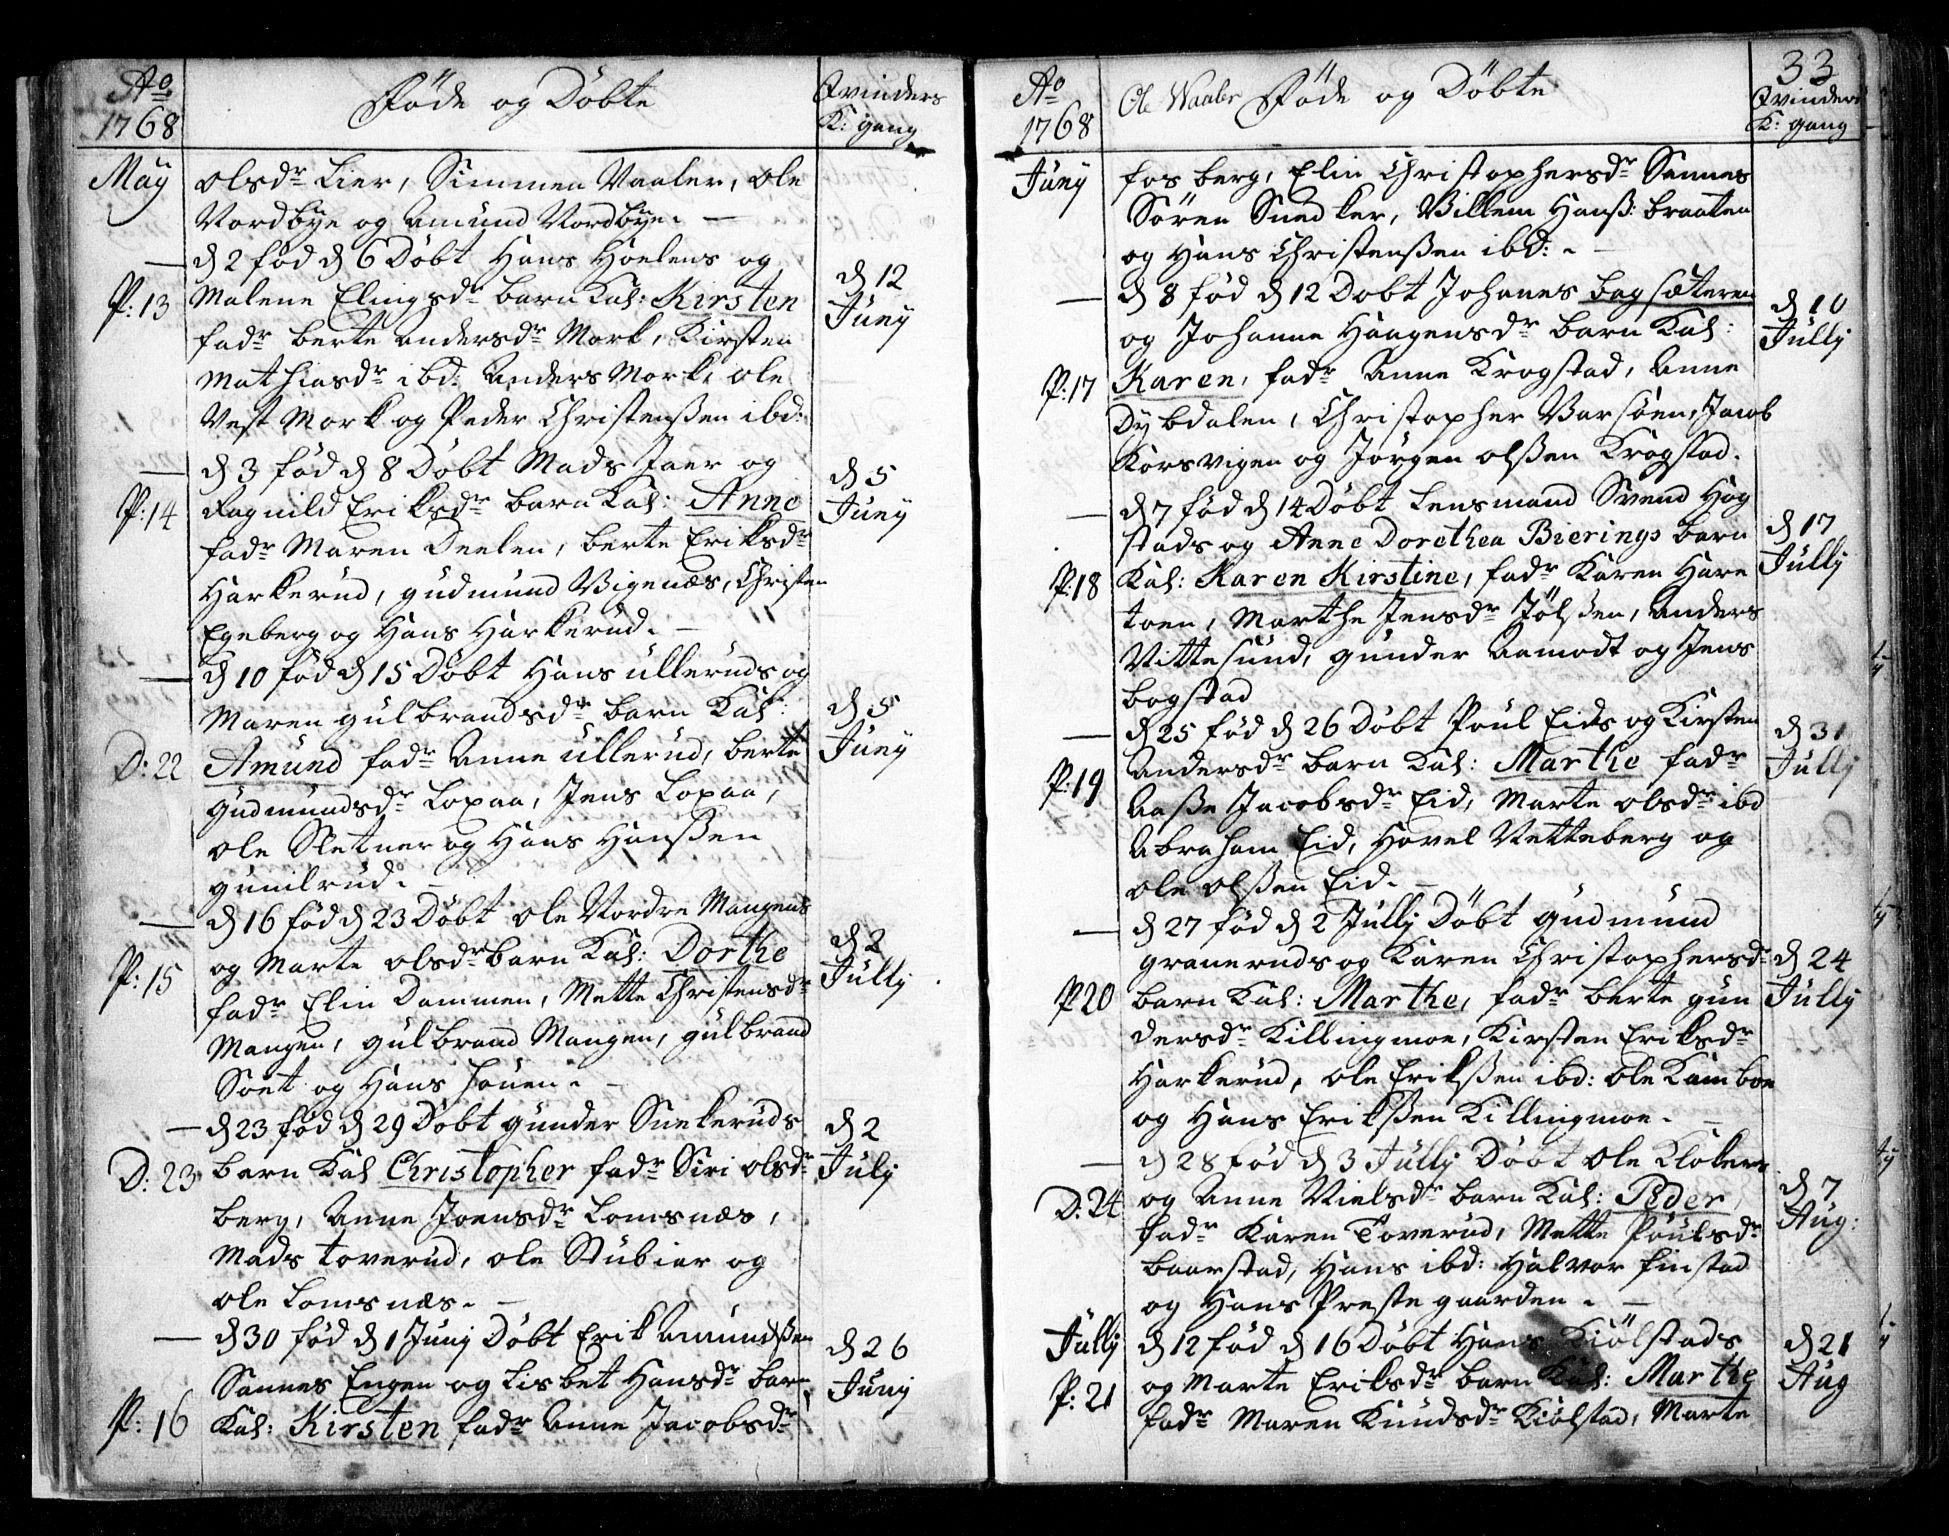 SAO, Aurskog prestekontor Kirkebøker, F/Fa/L0003: Ministerialbok nr. I 3, 1767-1807, s. 33